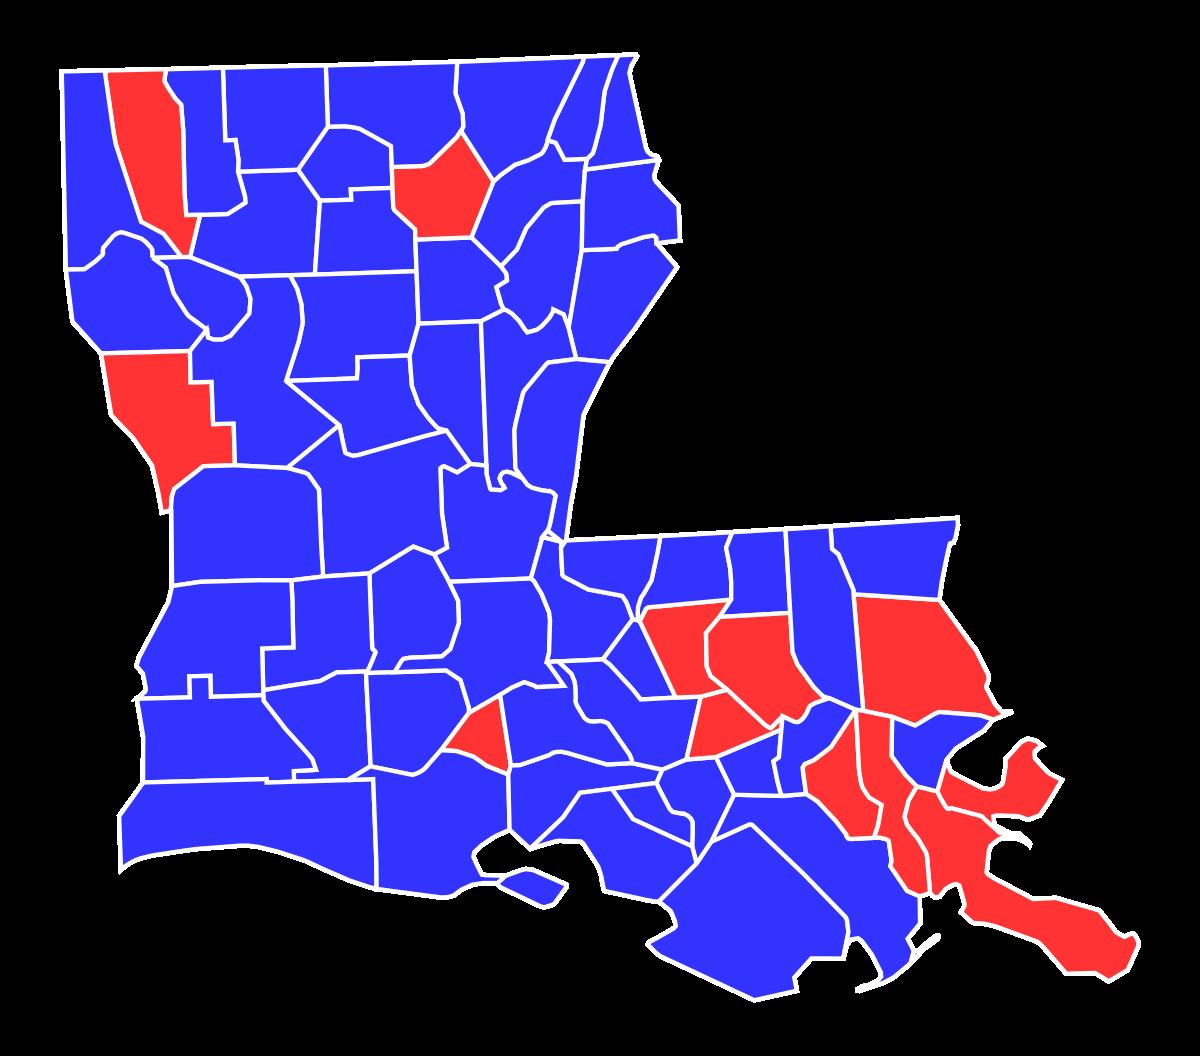 Democracy clipart poll tax. Louisiana gubernatorial election wikipedia